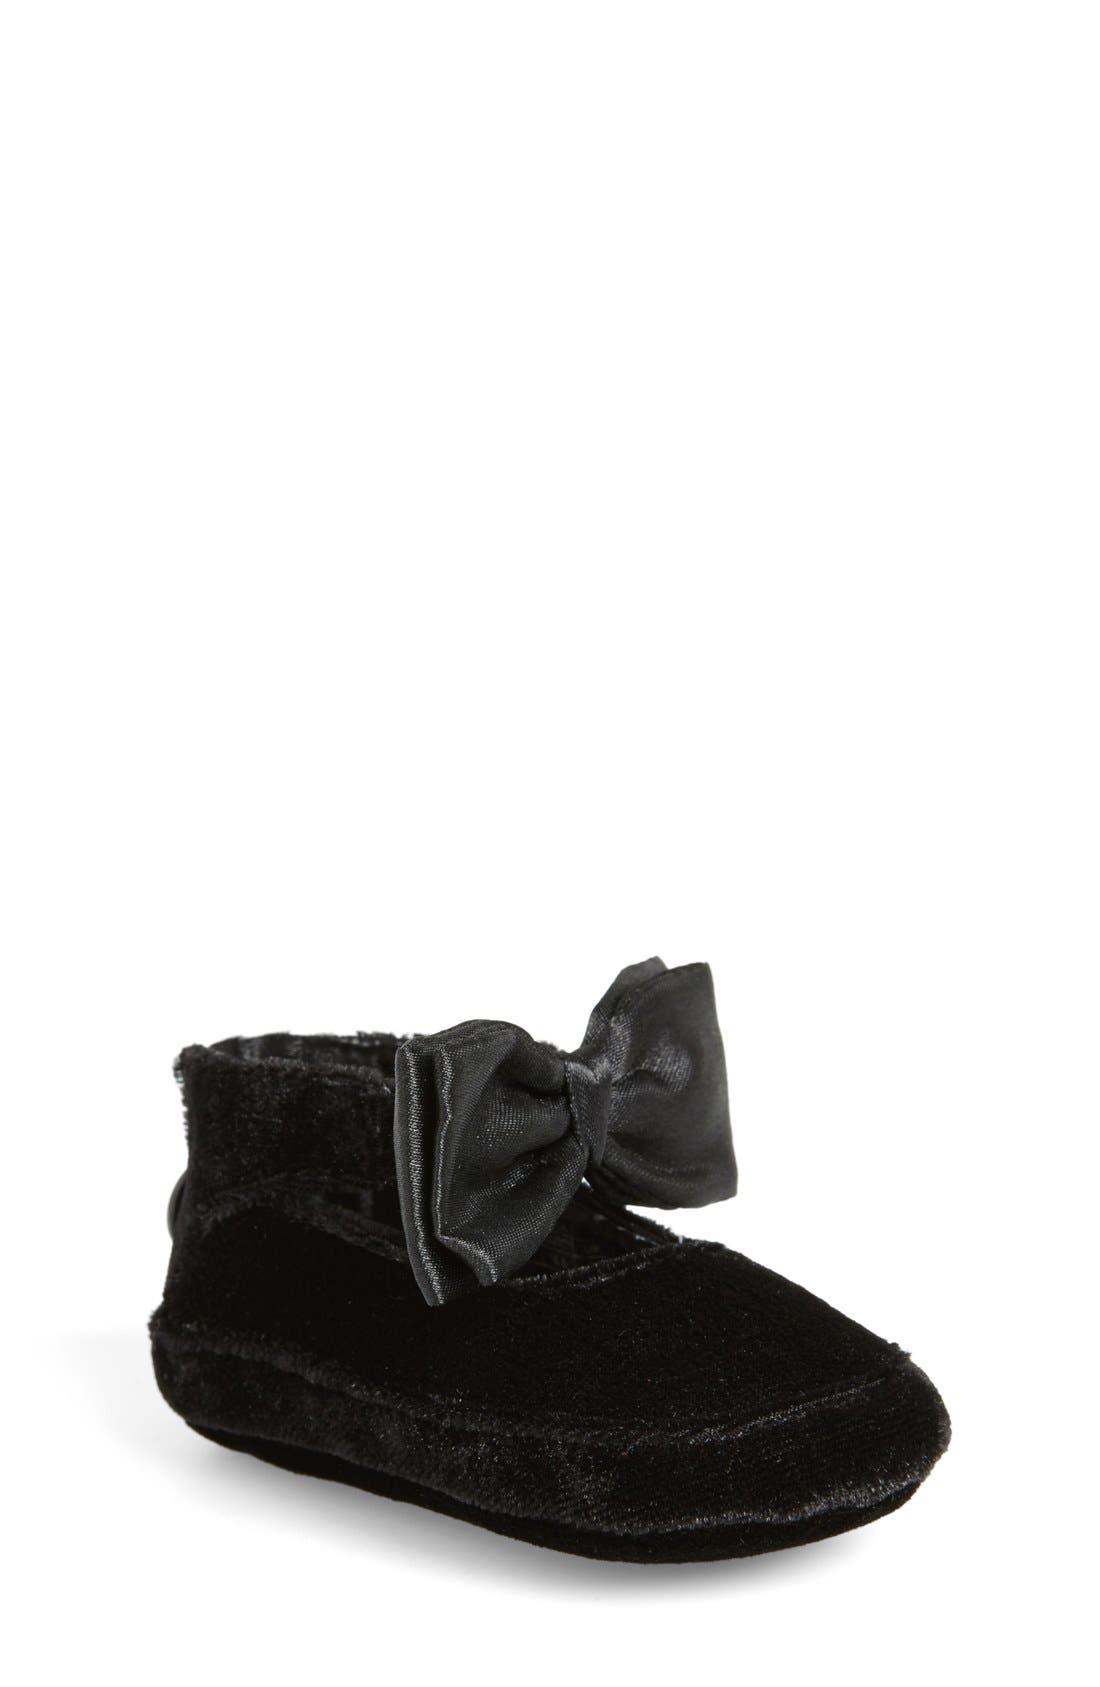 'Baby Nantucket' Crib Shoe,                         Main,                         color, 001